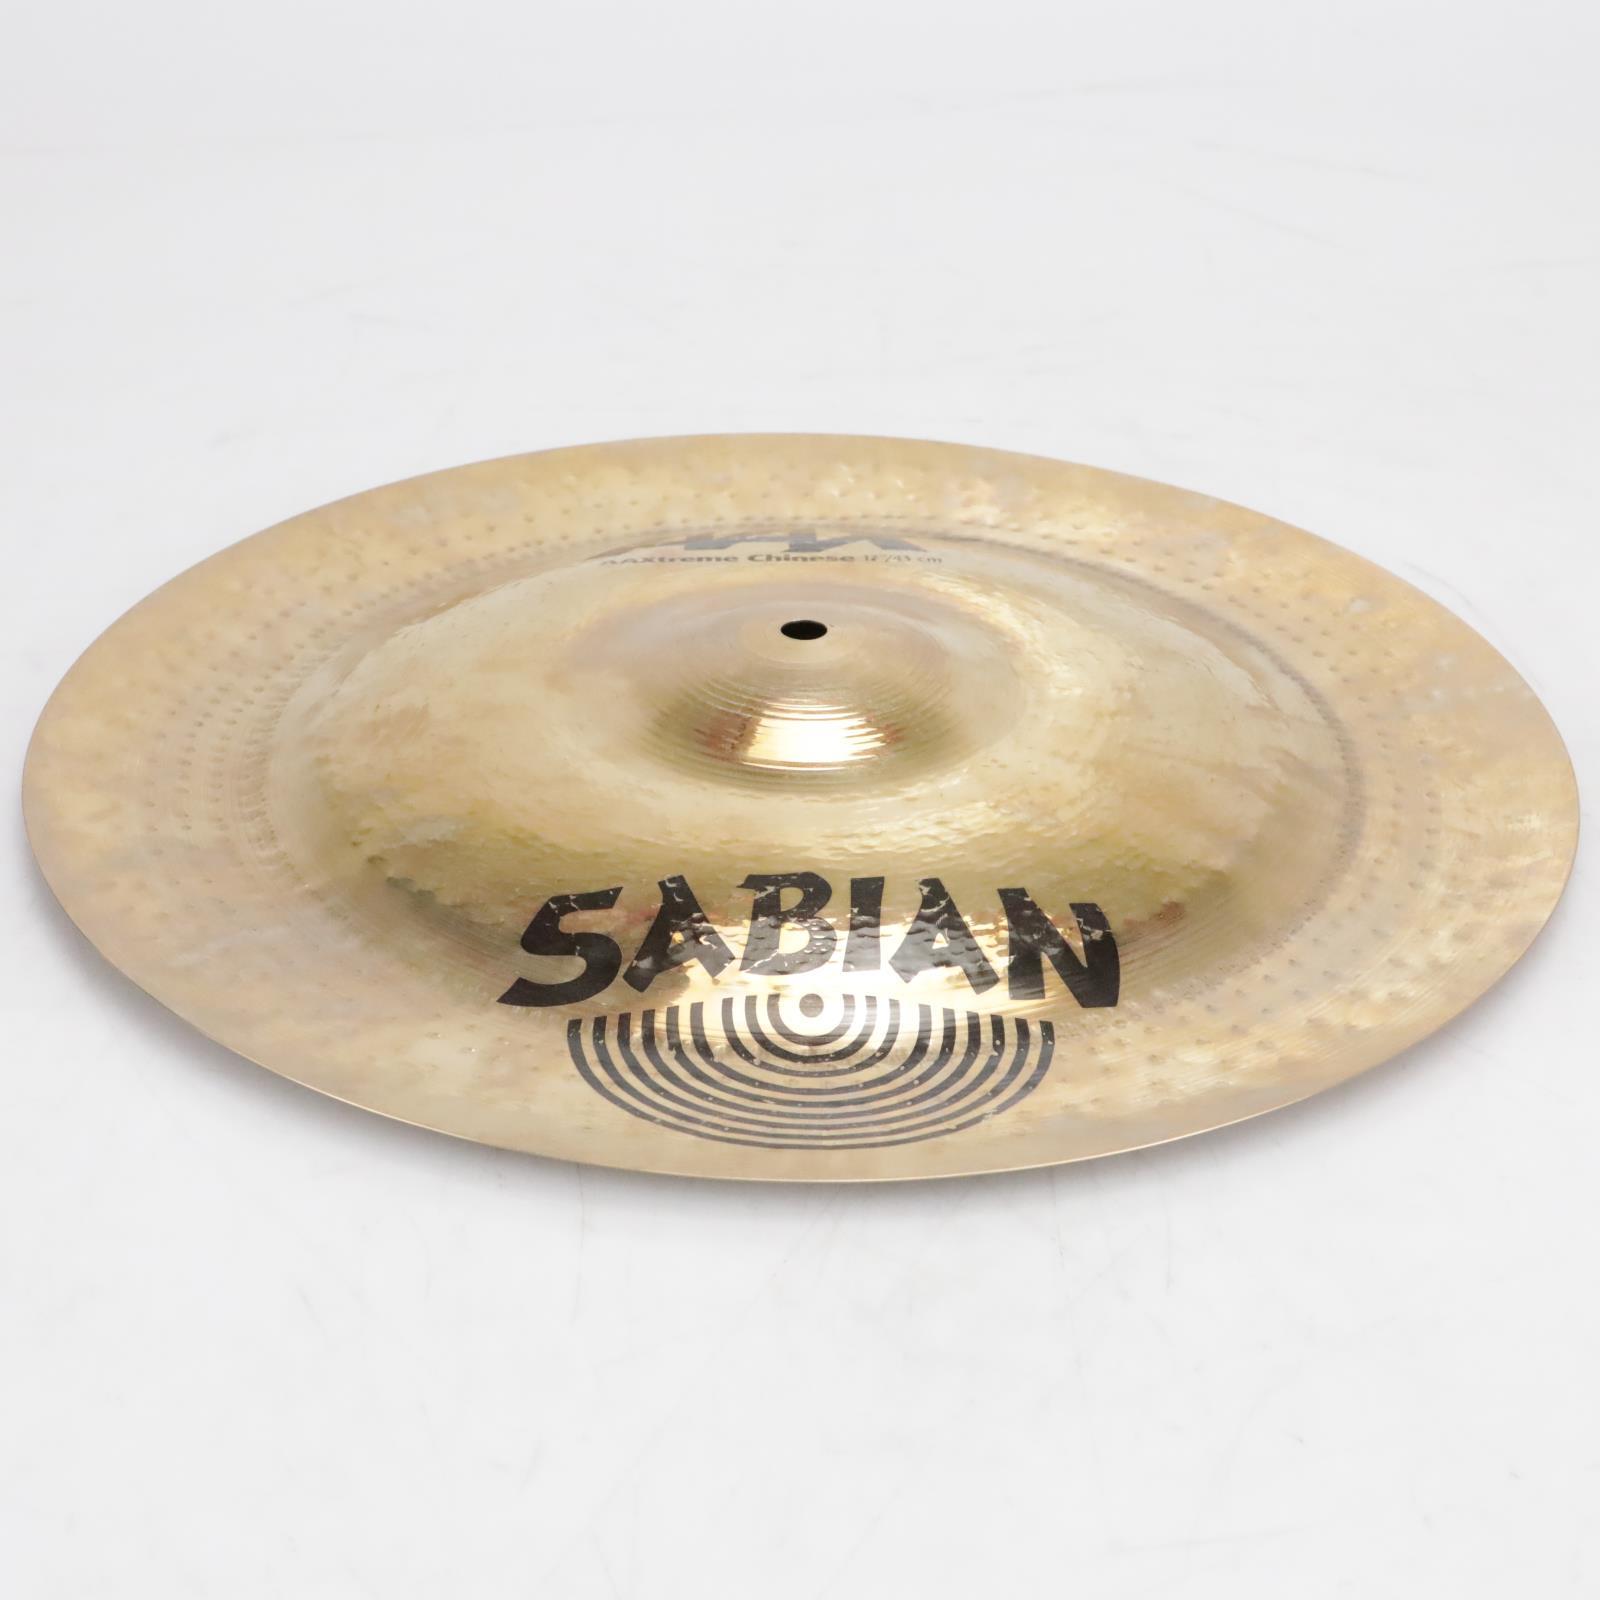 "Sabian 17"" AAXtreme Chinese Crash Cymbal Video! #41246"